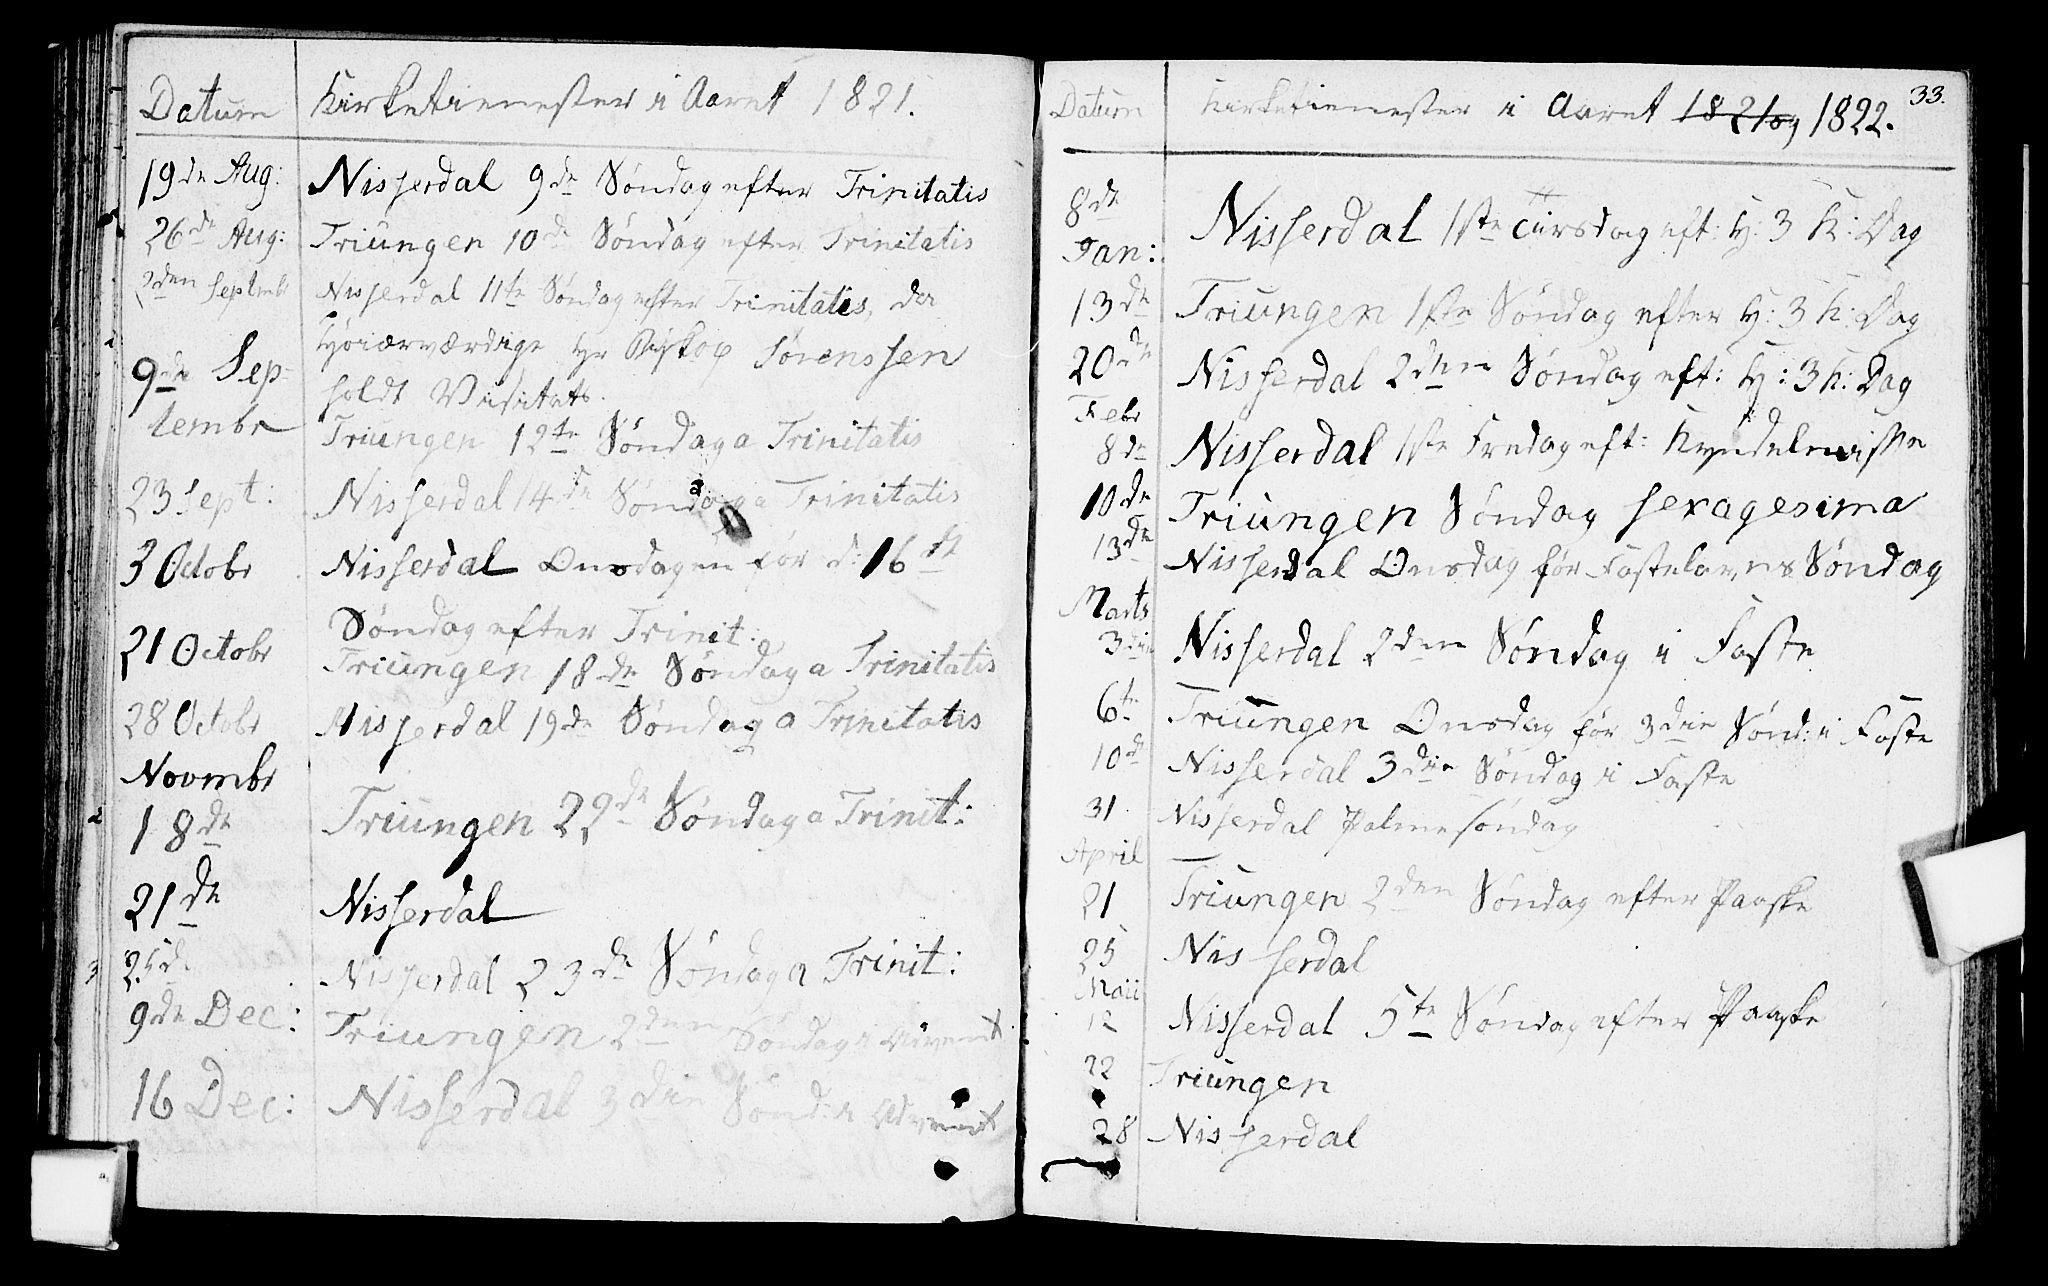 SAKO, Nissedal kirkebøker, F/Fa/L0001: Ministerialbok nr. I 1, 1811-1814, s. 33